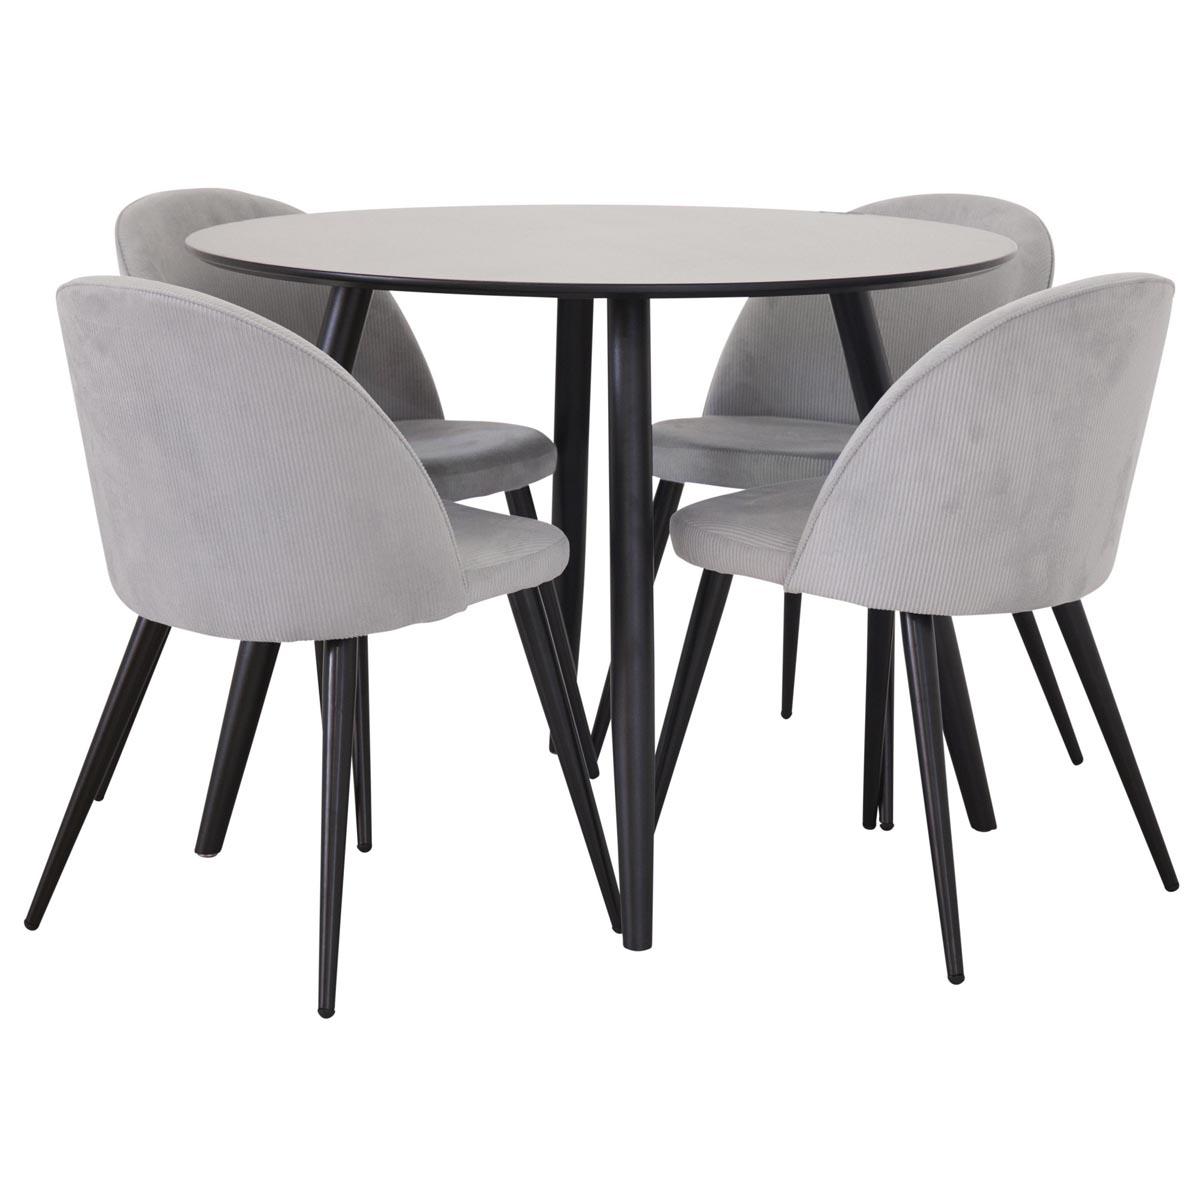 plaza matbord med 4 stolar velvet i grått manchestertyg